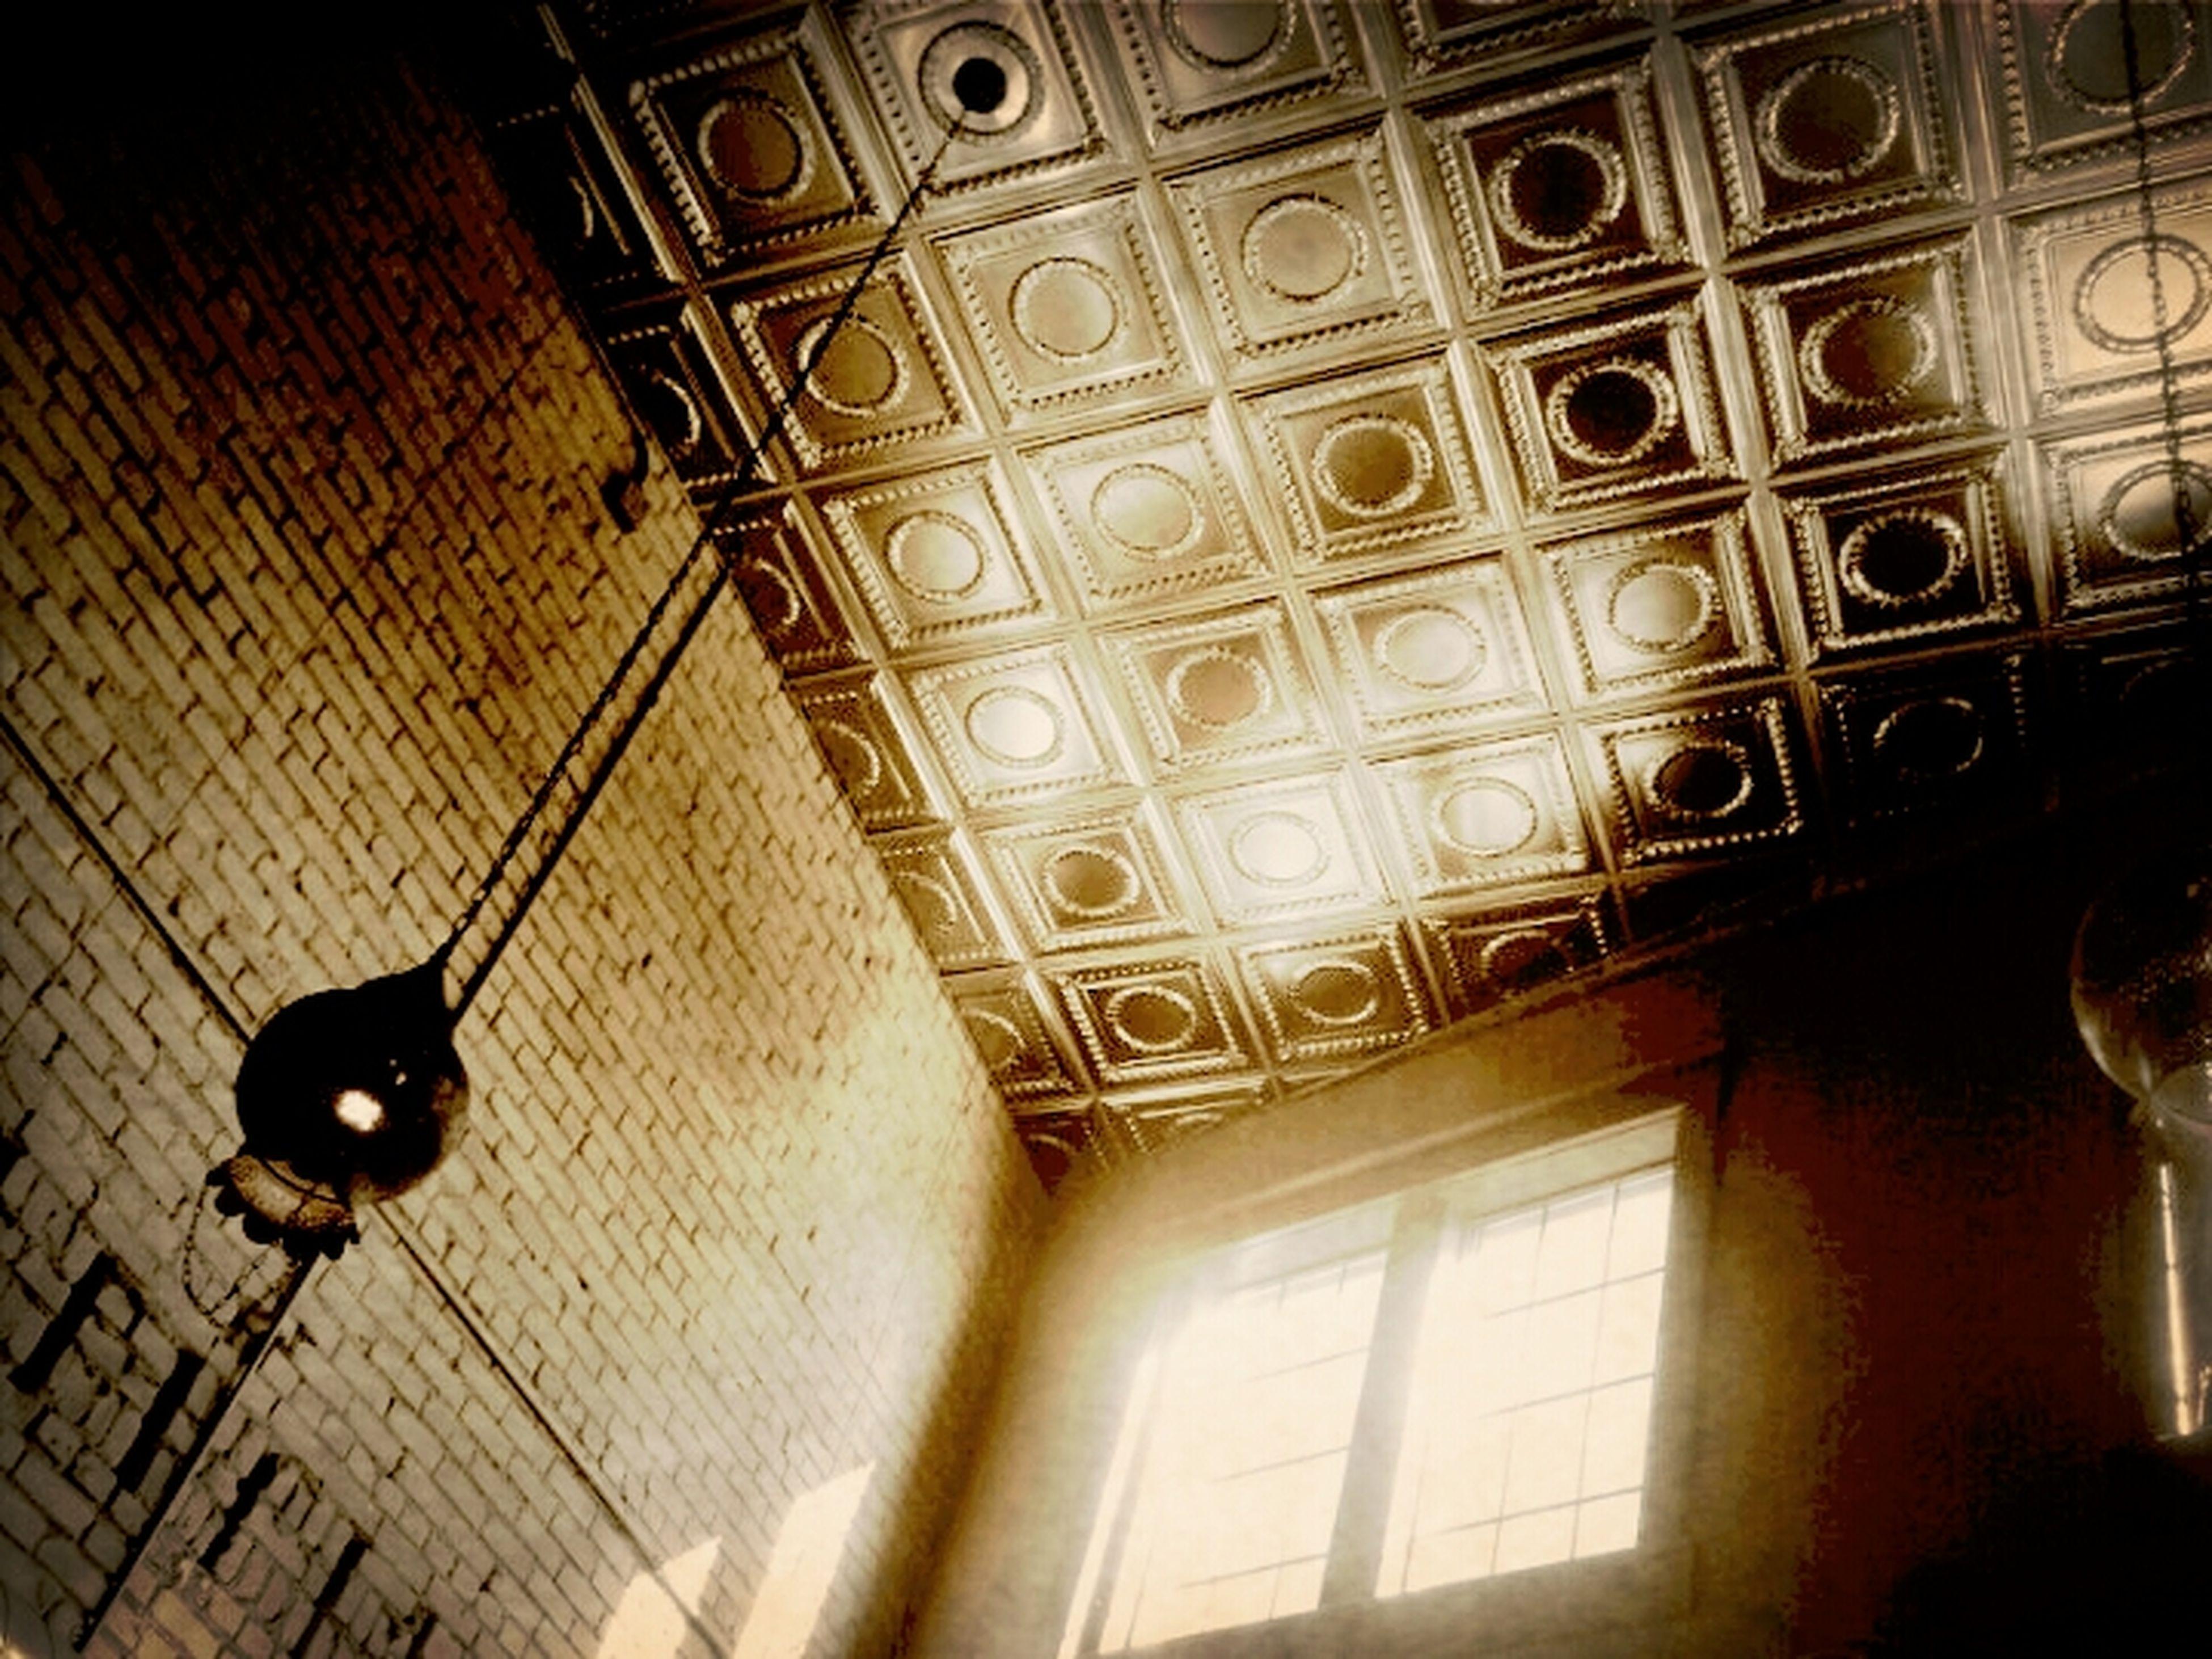 I love tin ceilings.